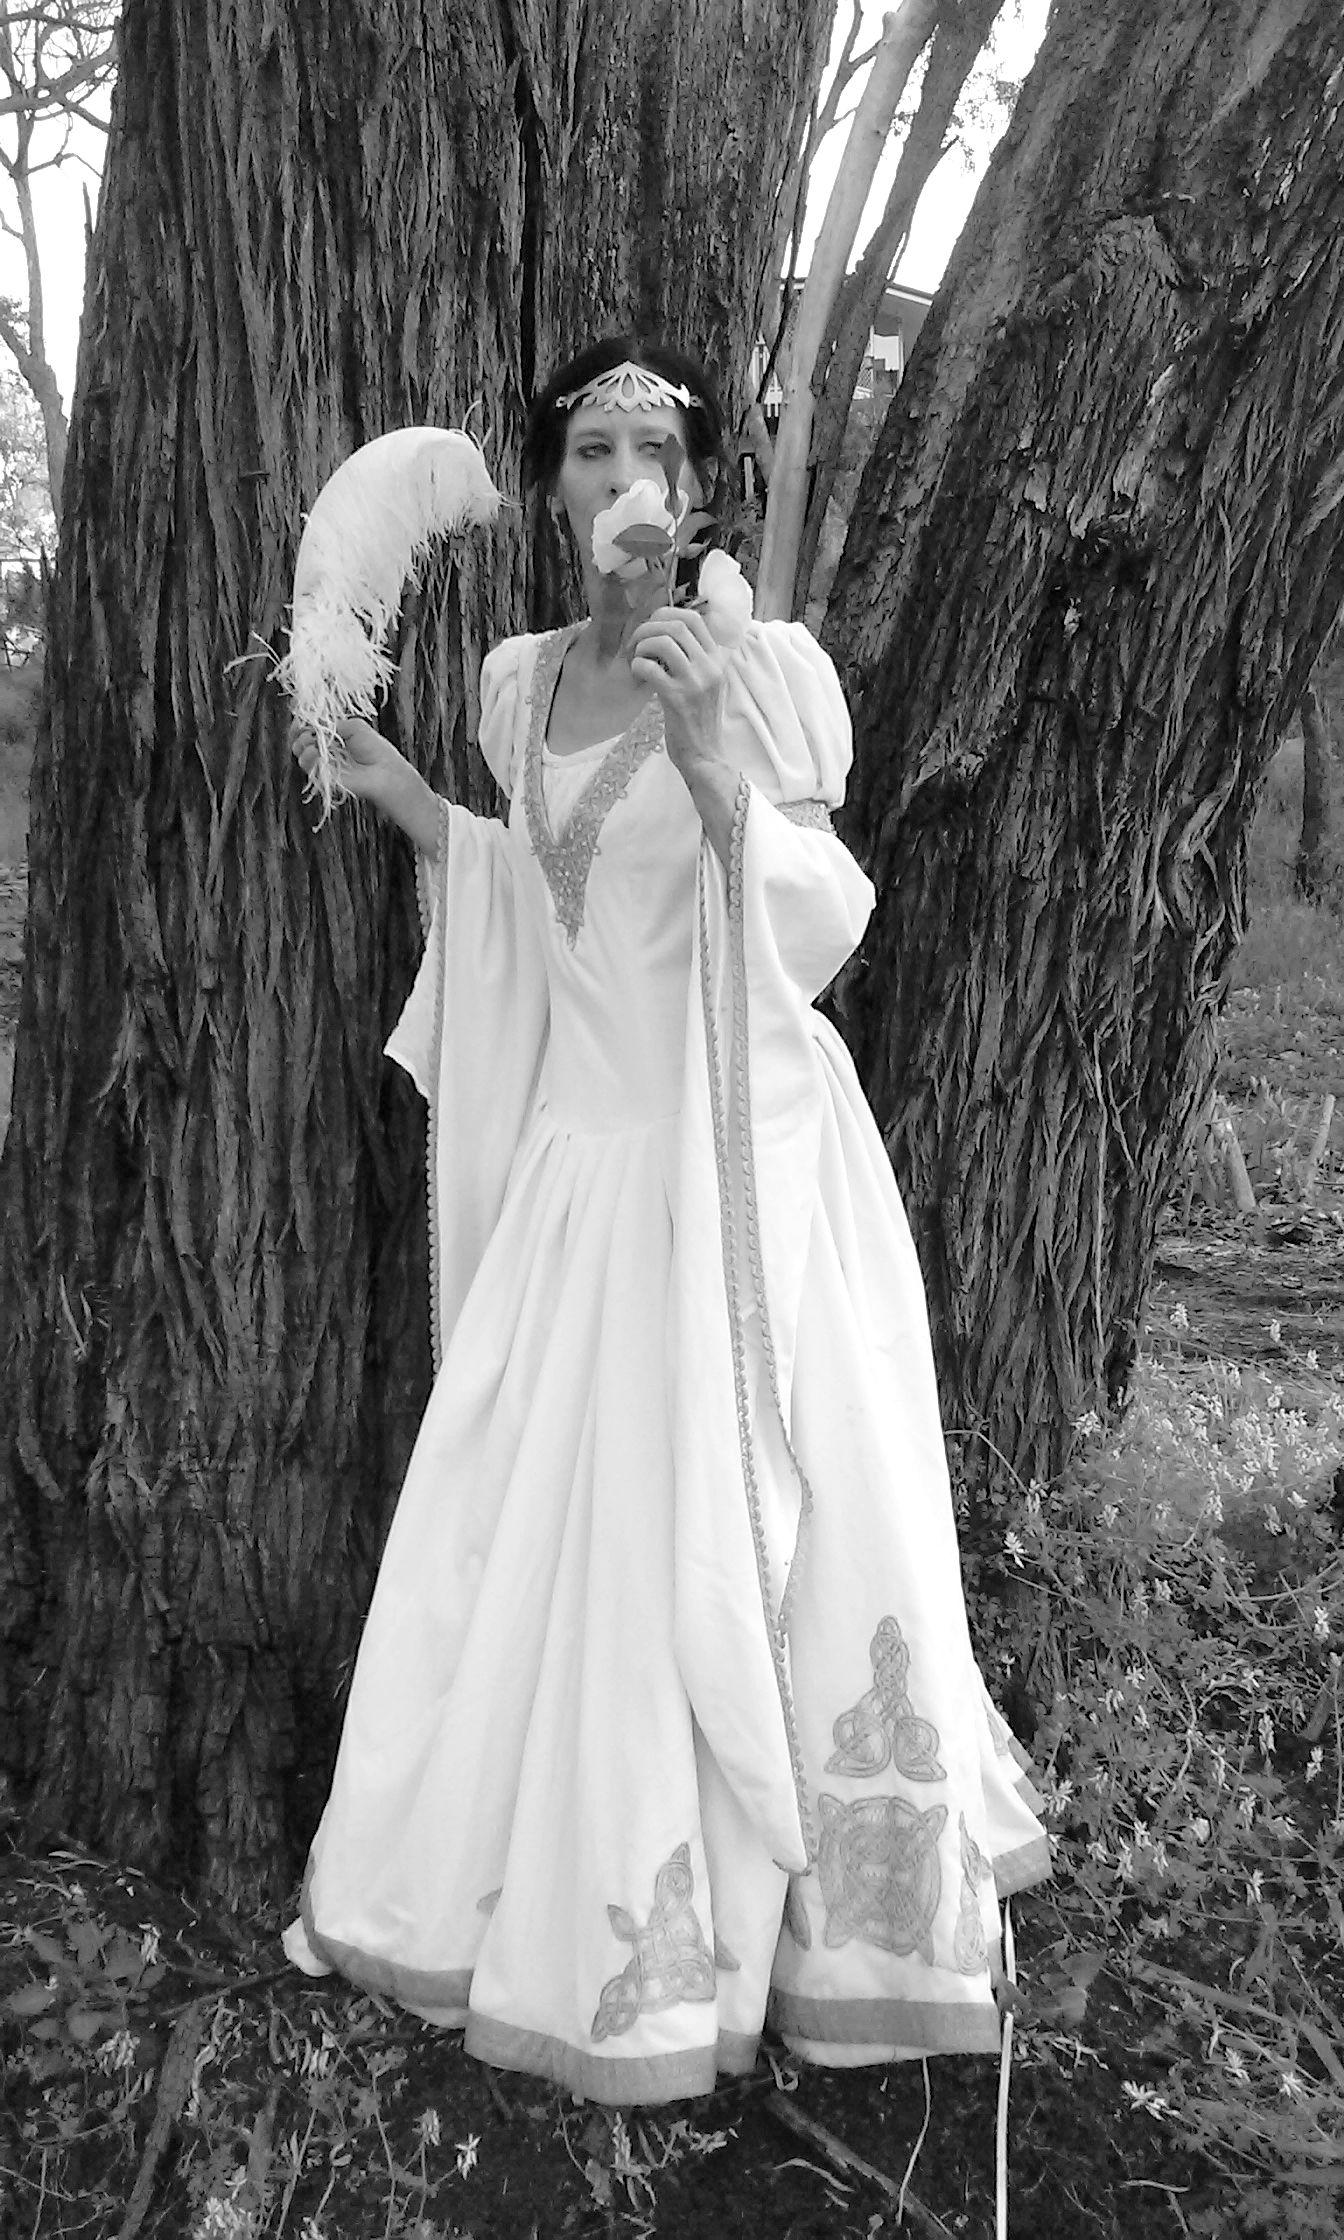 White Velvet Wedding Dress The Accolade Black Wedding Dress Gothic Velvet Wedding Dress Wedding Dresses [ 2240 x 1344 Pixel ]